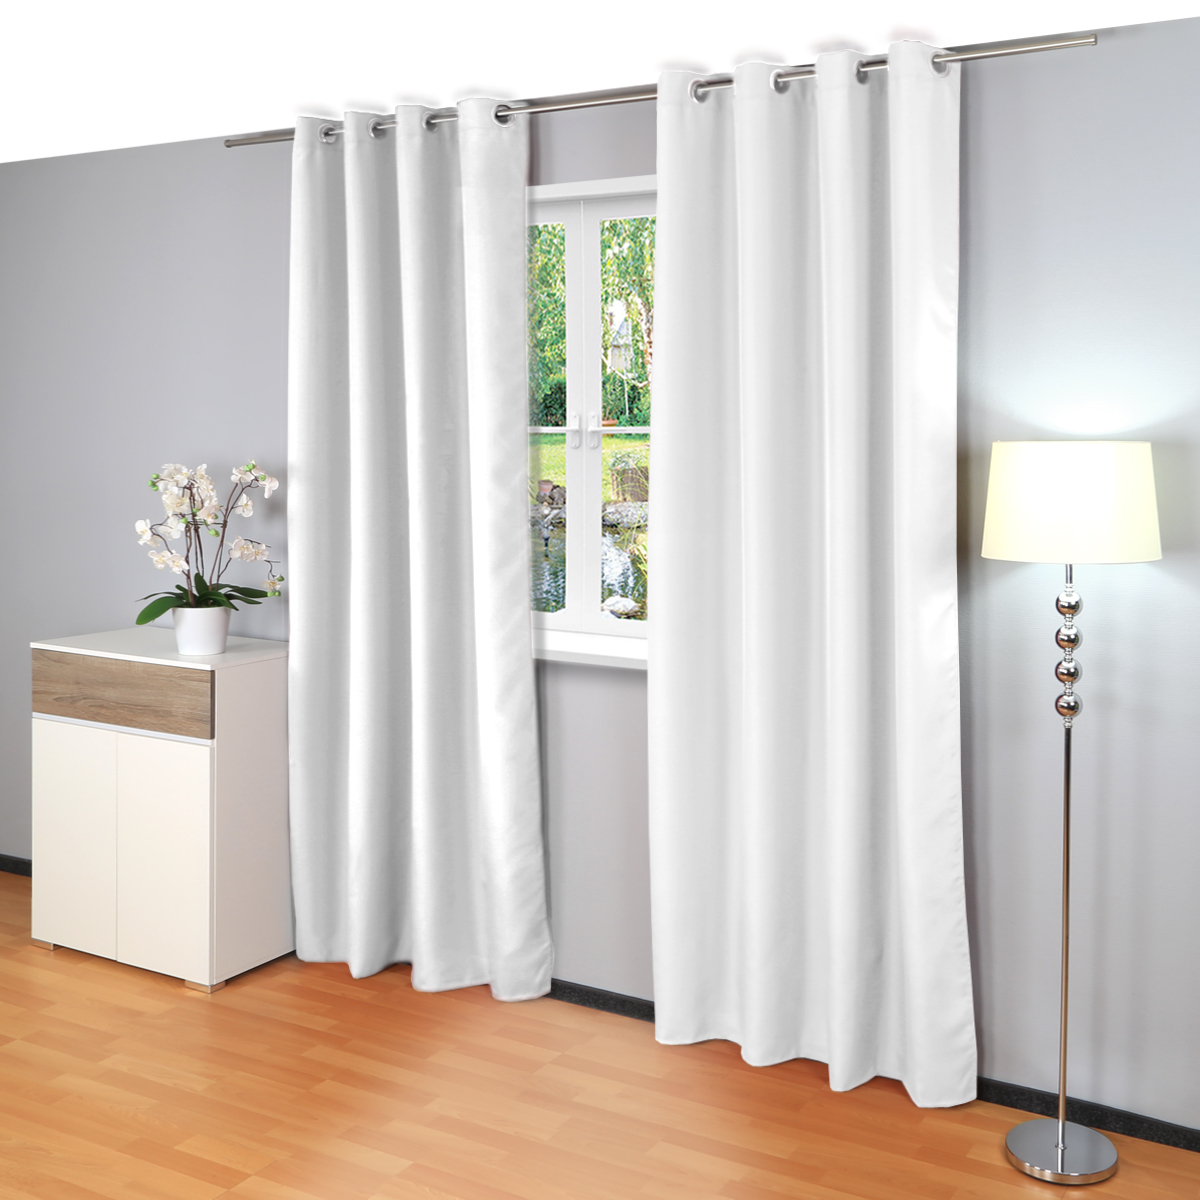 senvorhang ocean vorhang gardine senschal 140x245cm thermo blickdicht. Black Bedroom Furniture Sets. Home Design Ideas